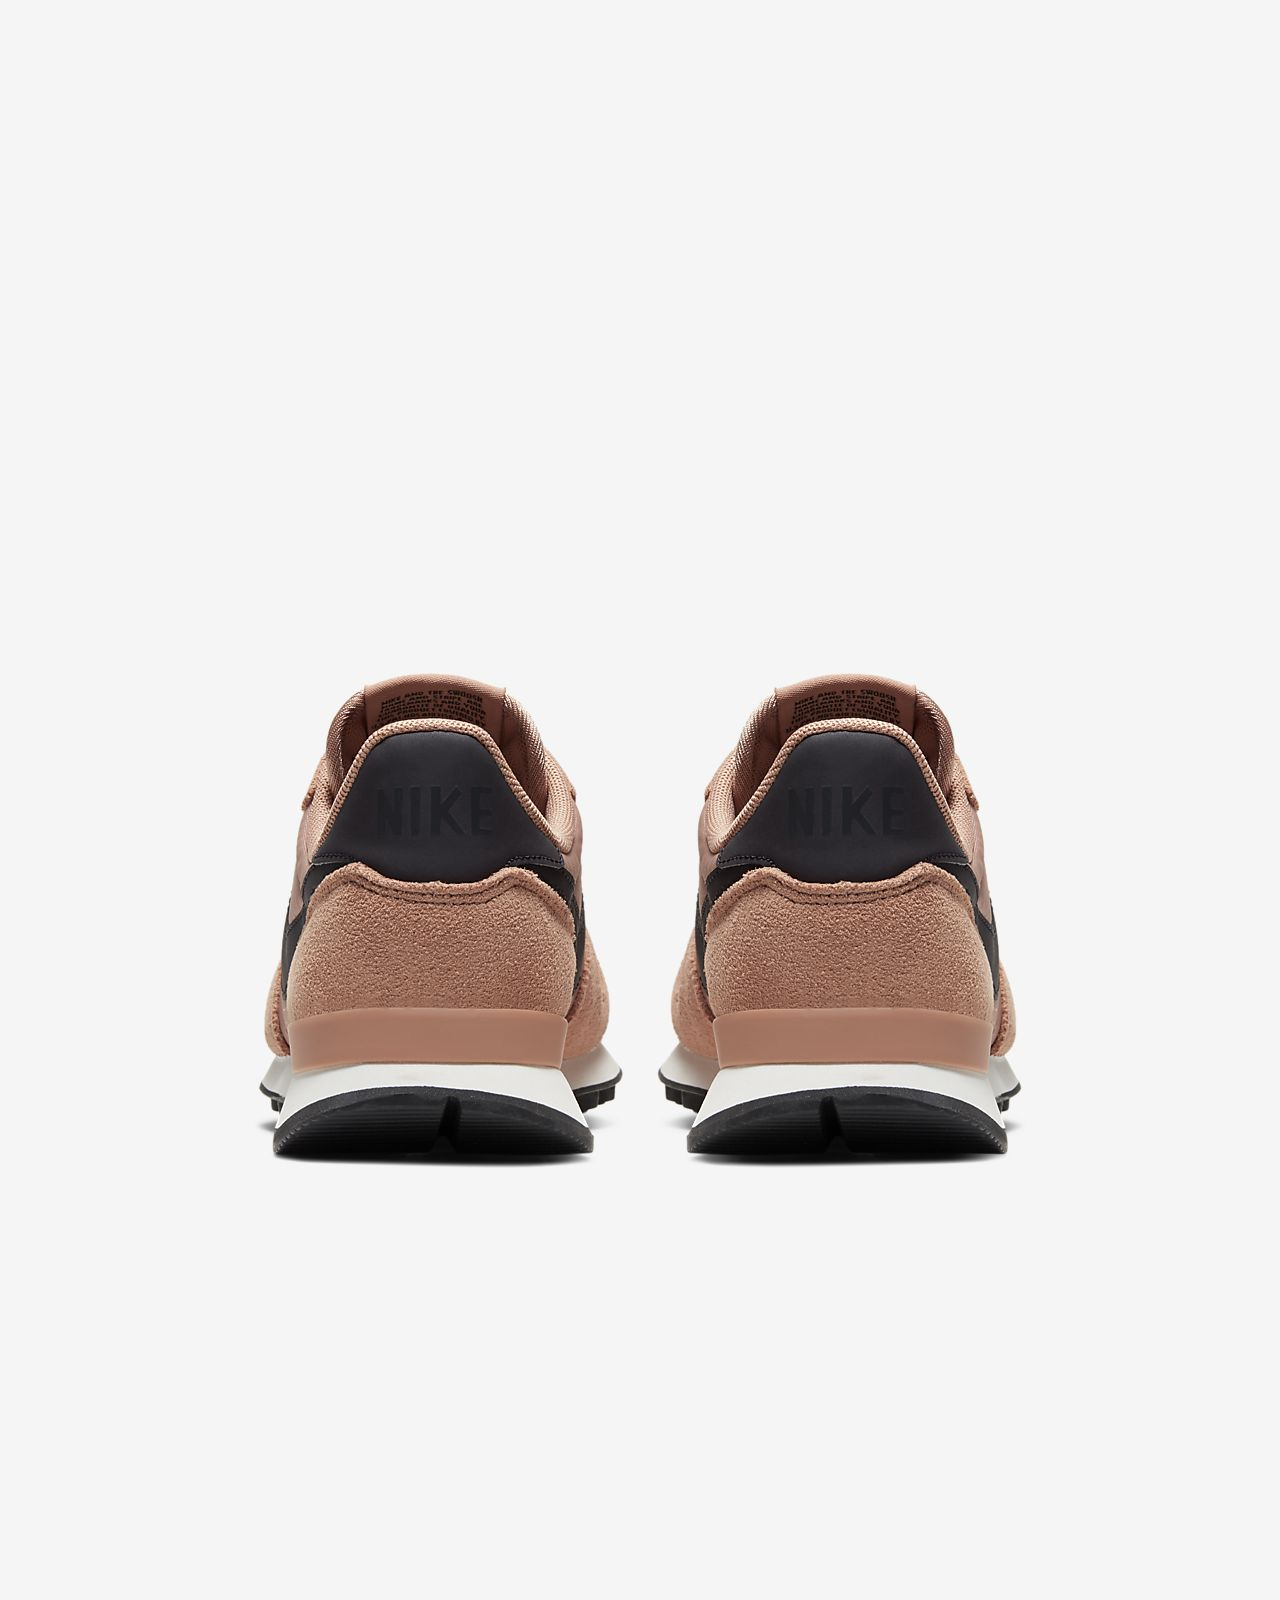 buy online 4a78d f754d Low Resolution Nike Internationalist Women's Shoe Nike Internationalist  Women's Shoe